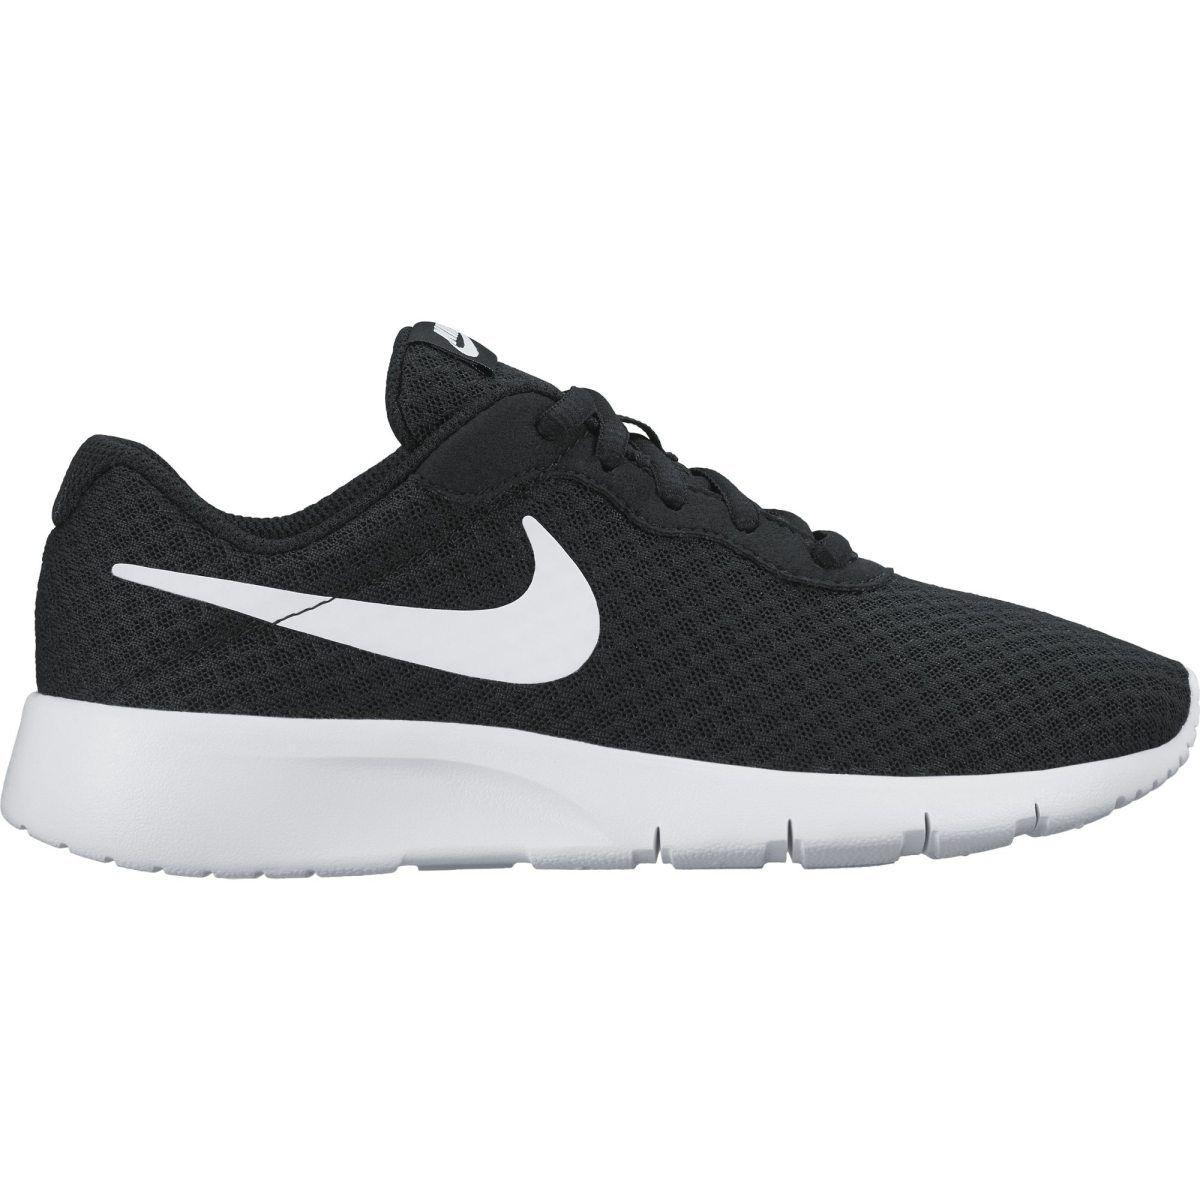 lowest price 617c6 043e7 Svart Nike Tanjun Gs, fritidssko junior - Fritidsskor och sneakers Barn -  xxl.se